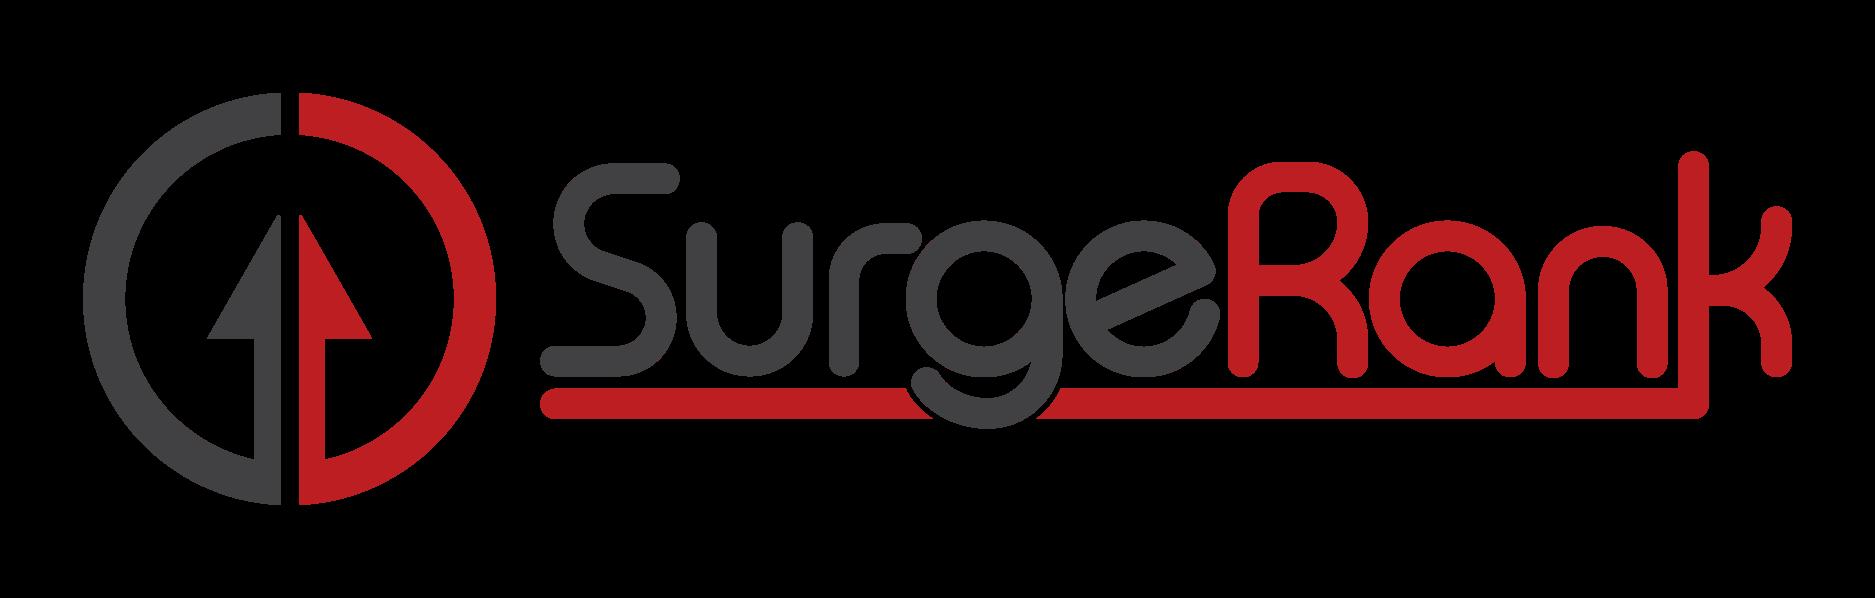 surge rank logo